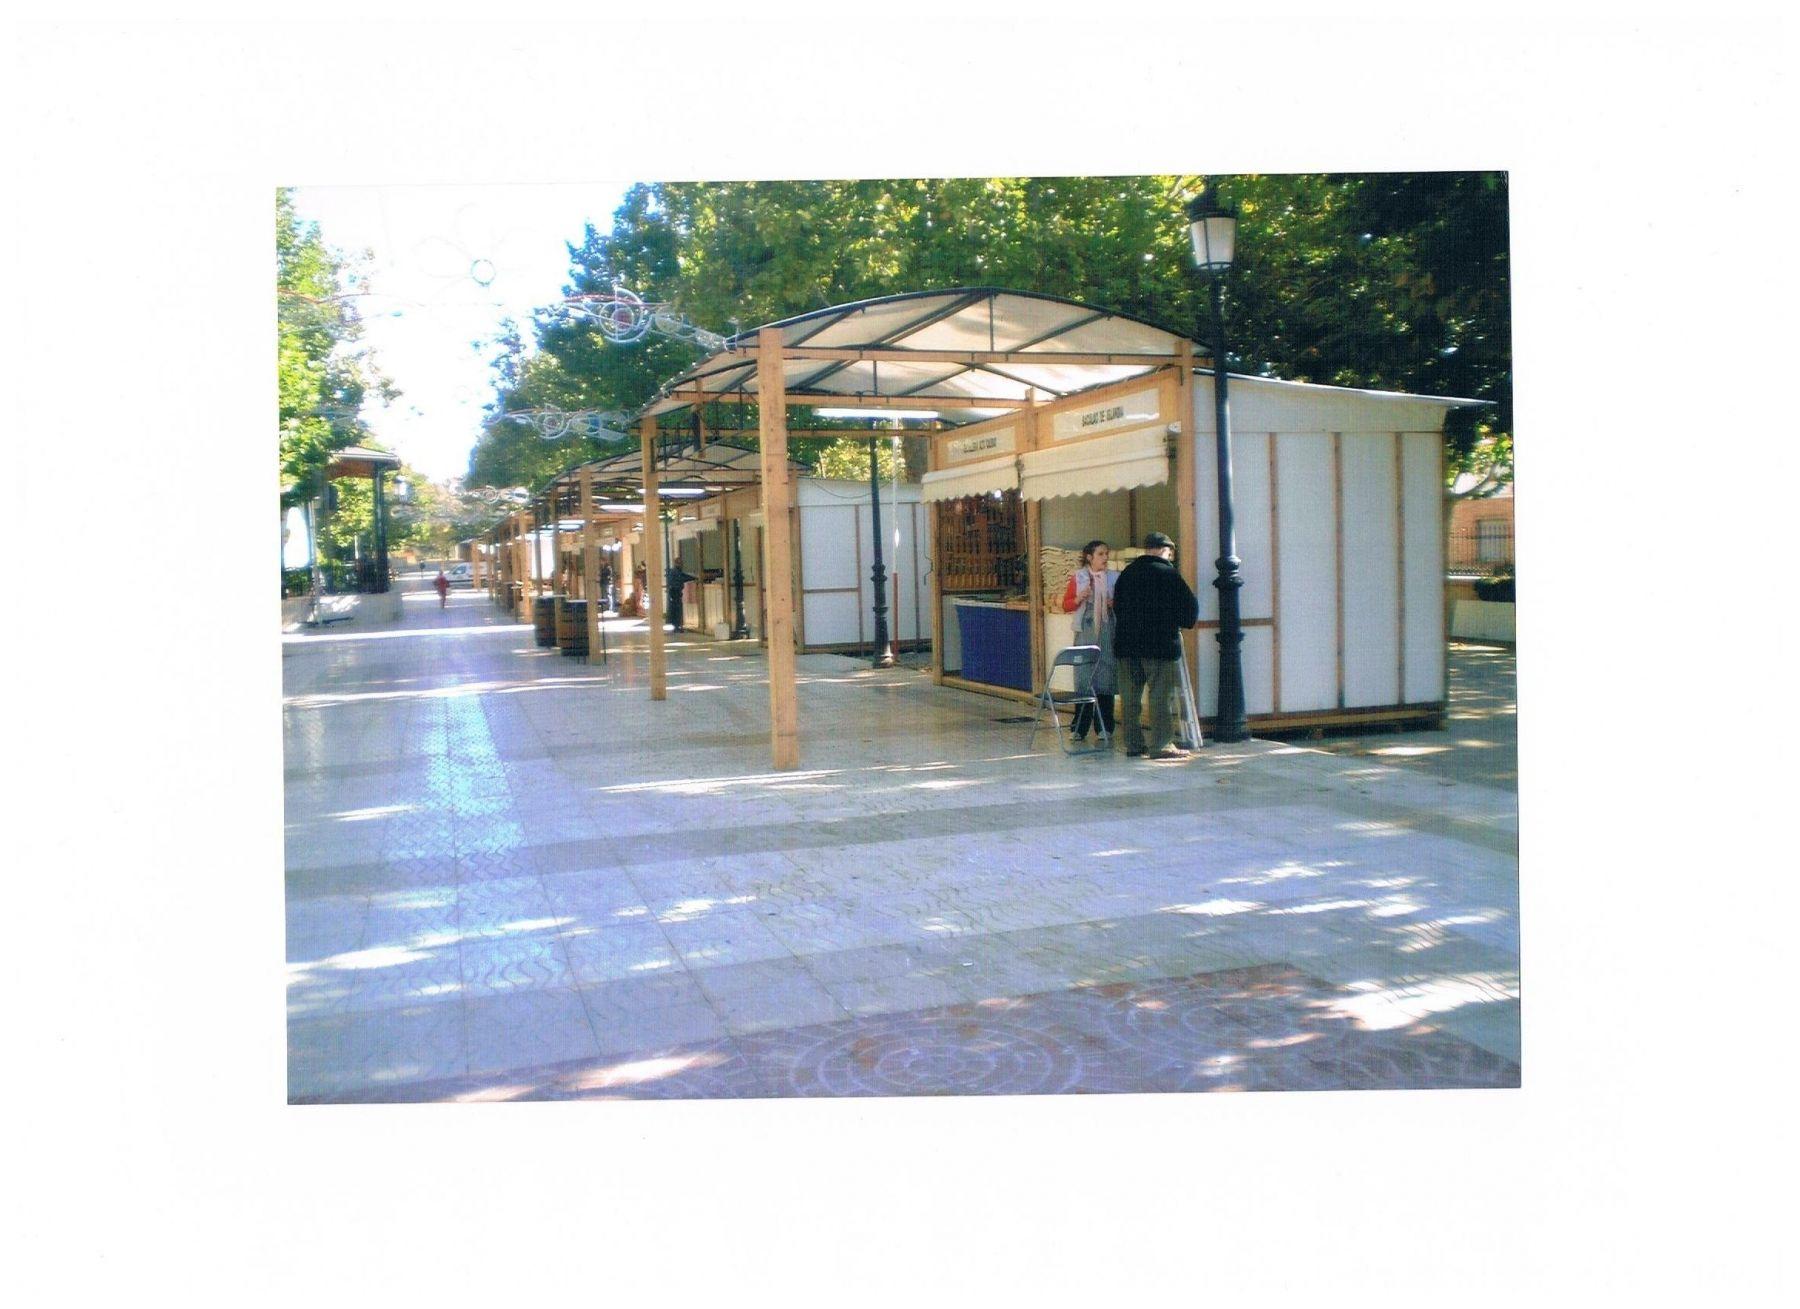 Expo Stands Montajes 2003 : Stands montajes y eventos sl valencia